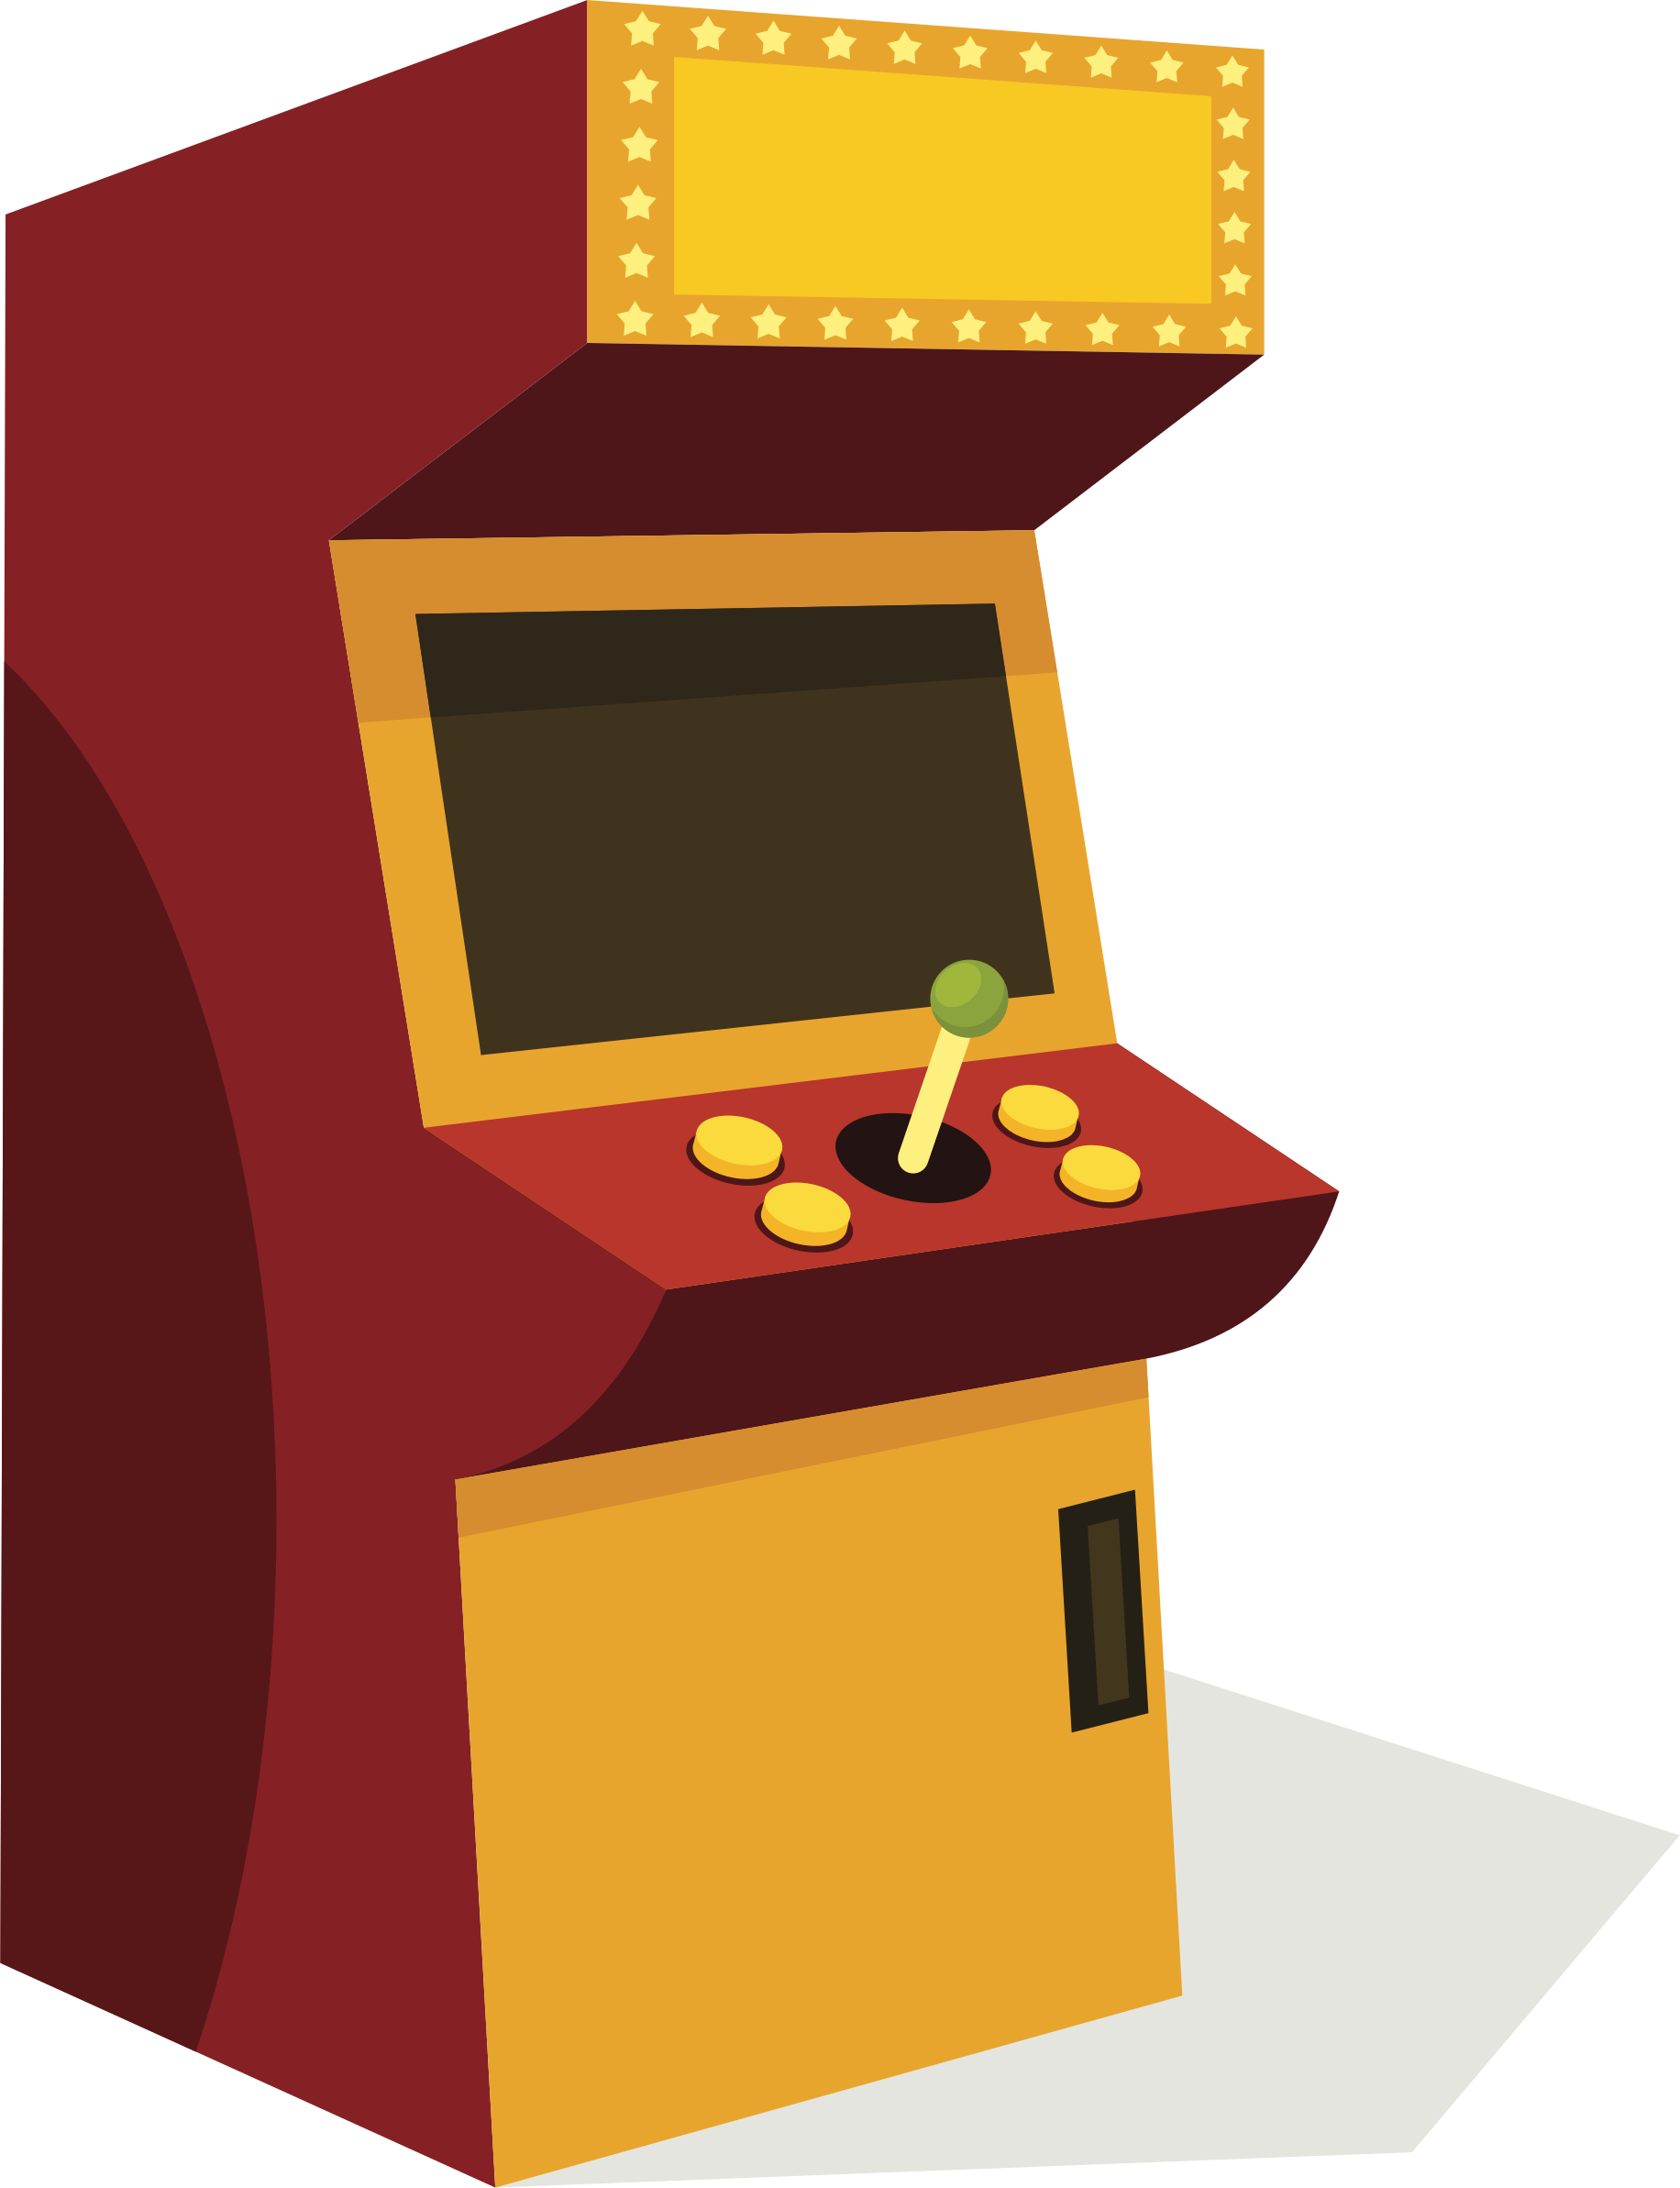 Joystick Clipart Arcade Arcade Machine Clipart.